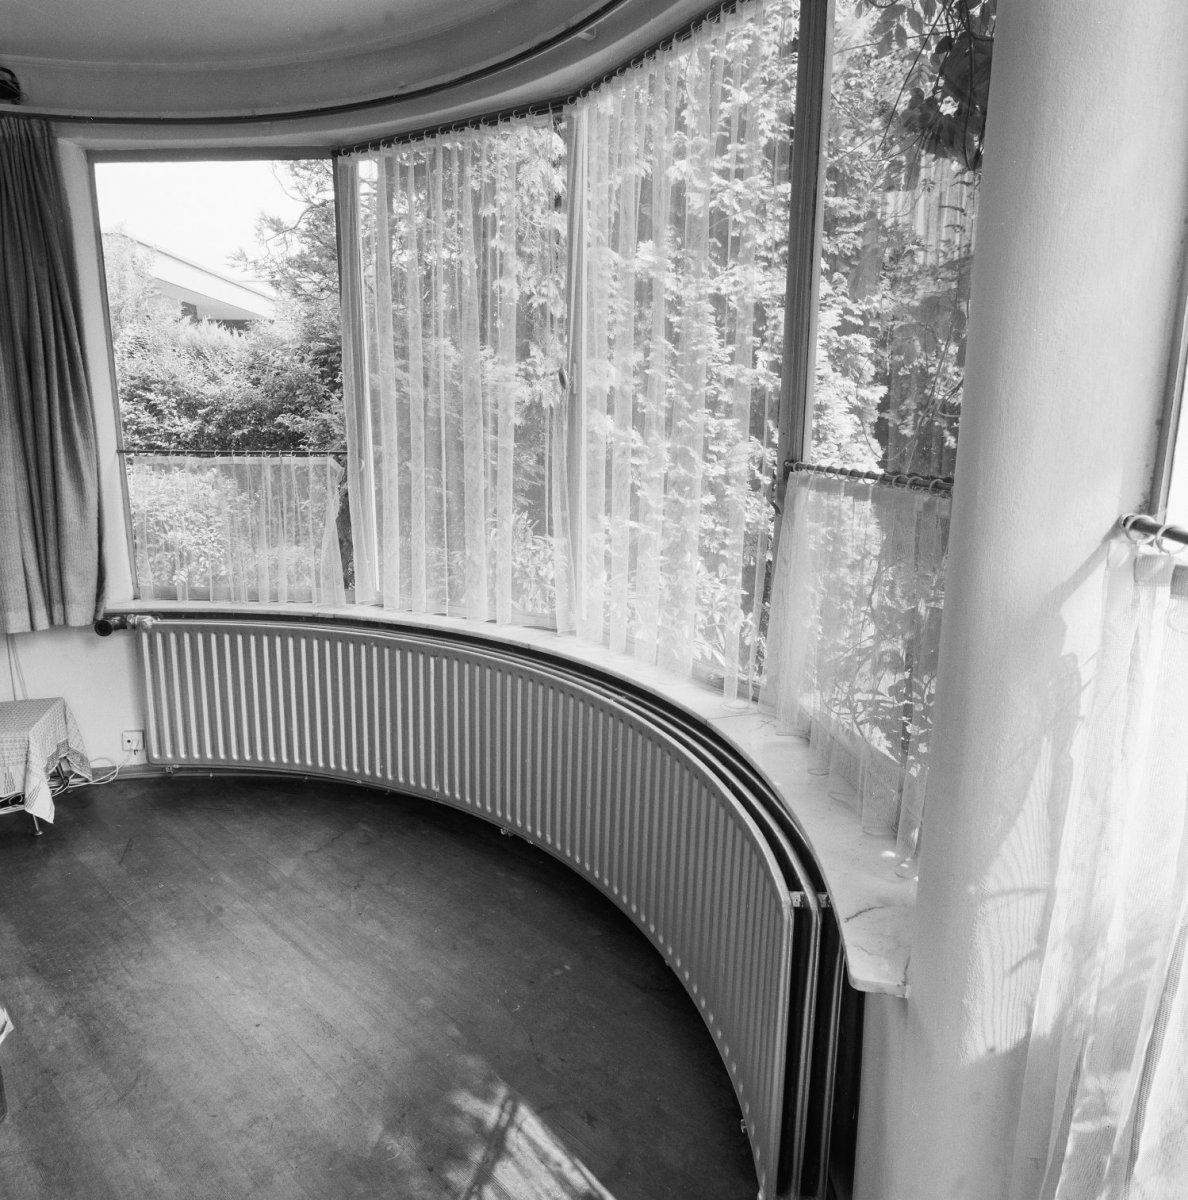 File interieur woonkamer rondlopende centrale verwarming utrecht 20340420 - Interieur woonkamer ...